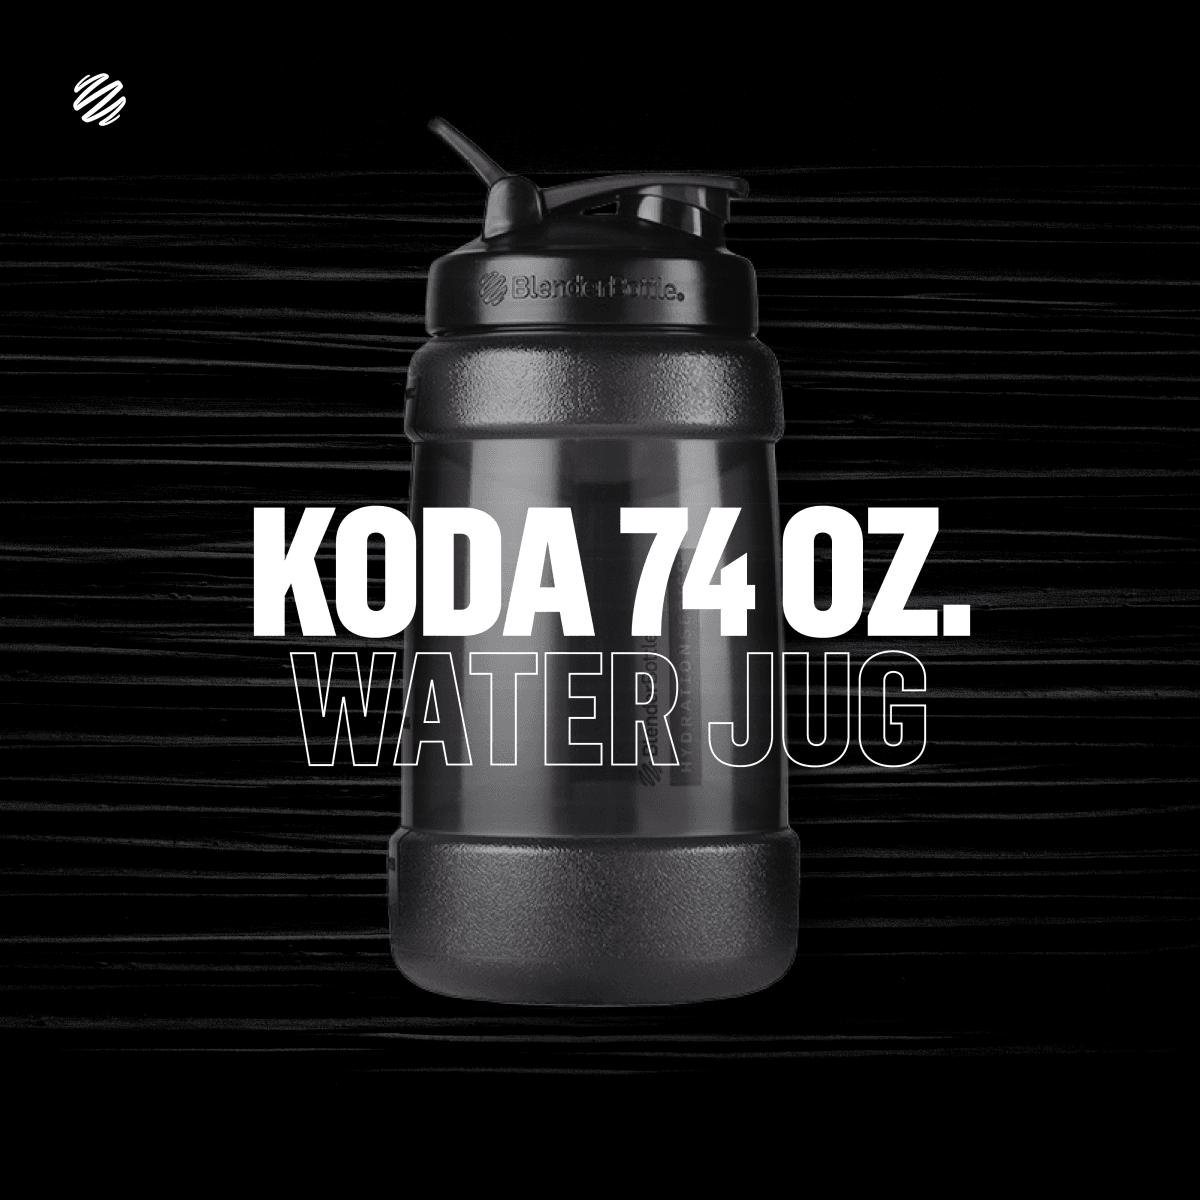 【Blender Bottle】Koda系列 巨無壩水壺 一天水的需求量 2.2公升 4